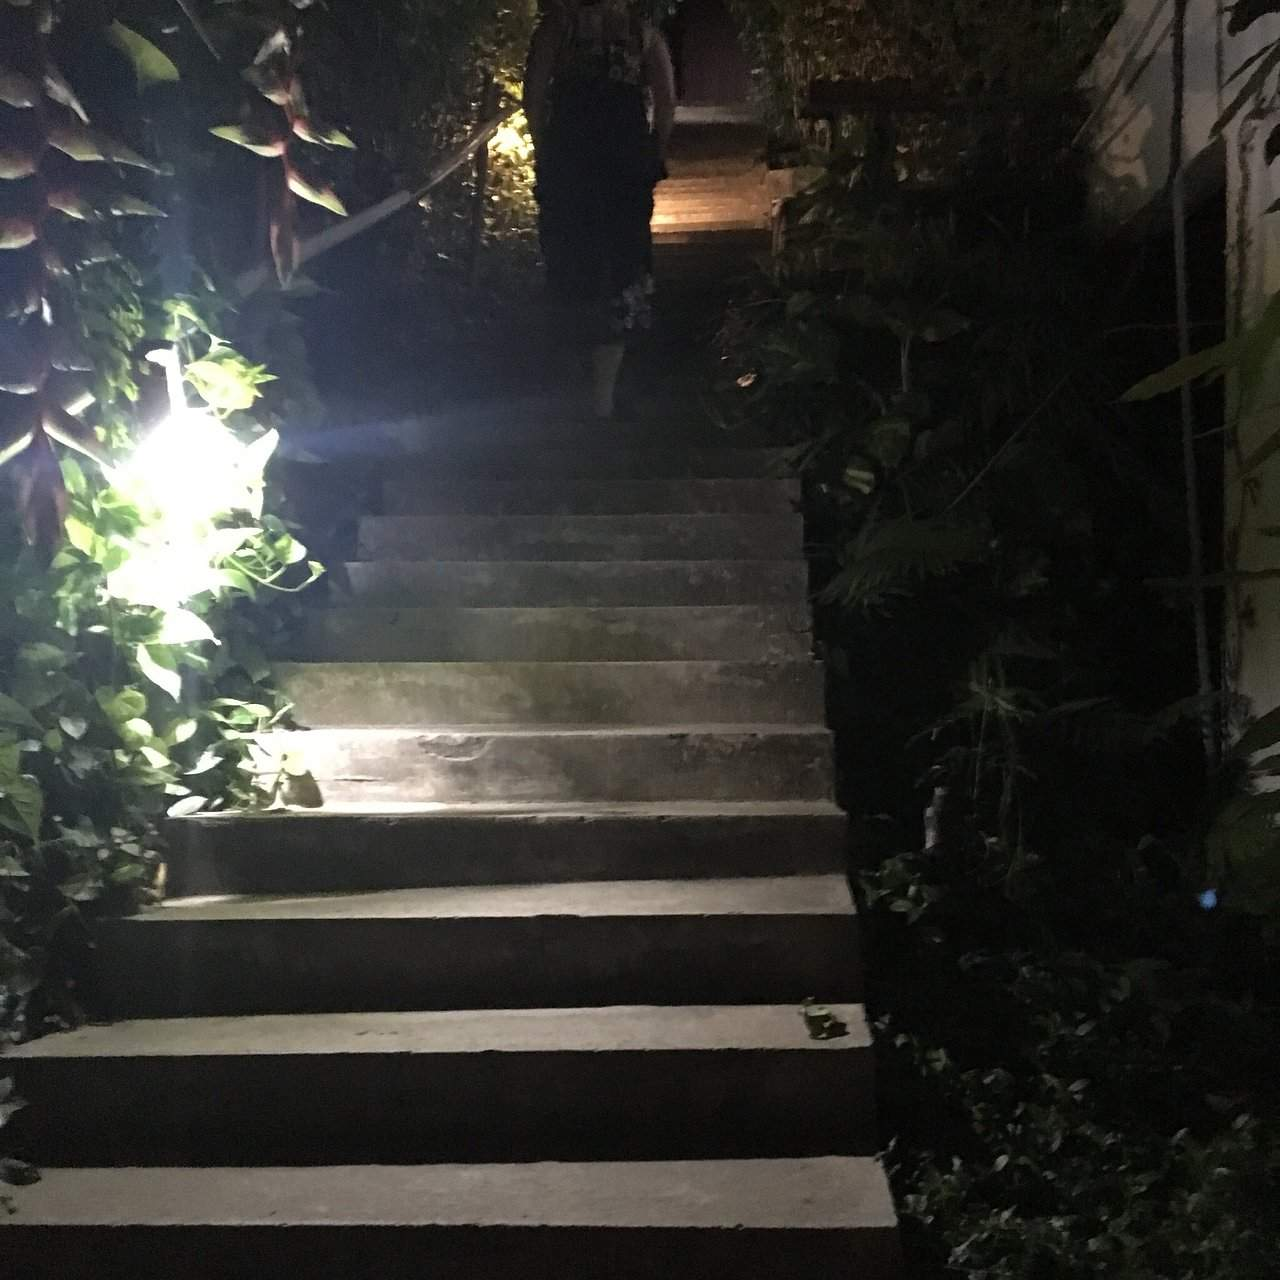 Garten Bungalow Kaufen Genial Bill Resort Ab 22€ 4̶7̶€Ì¶ Bewertungen Fotos